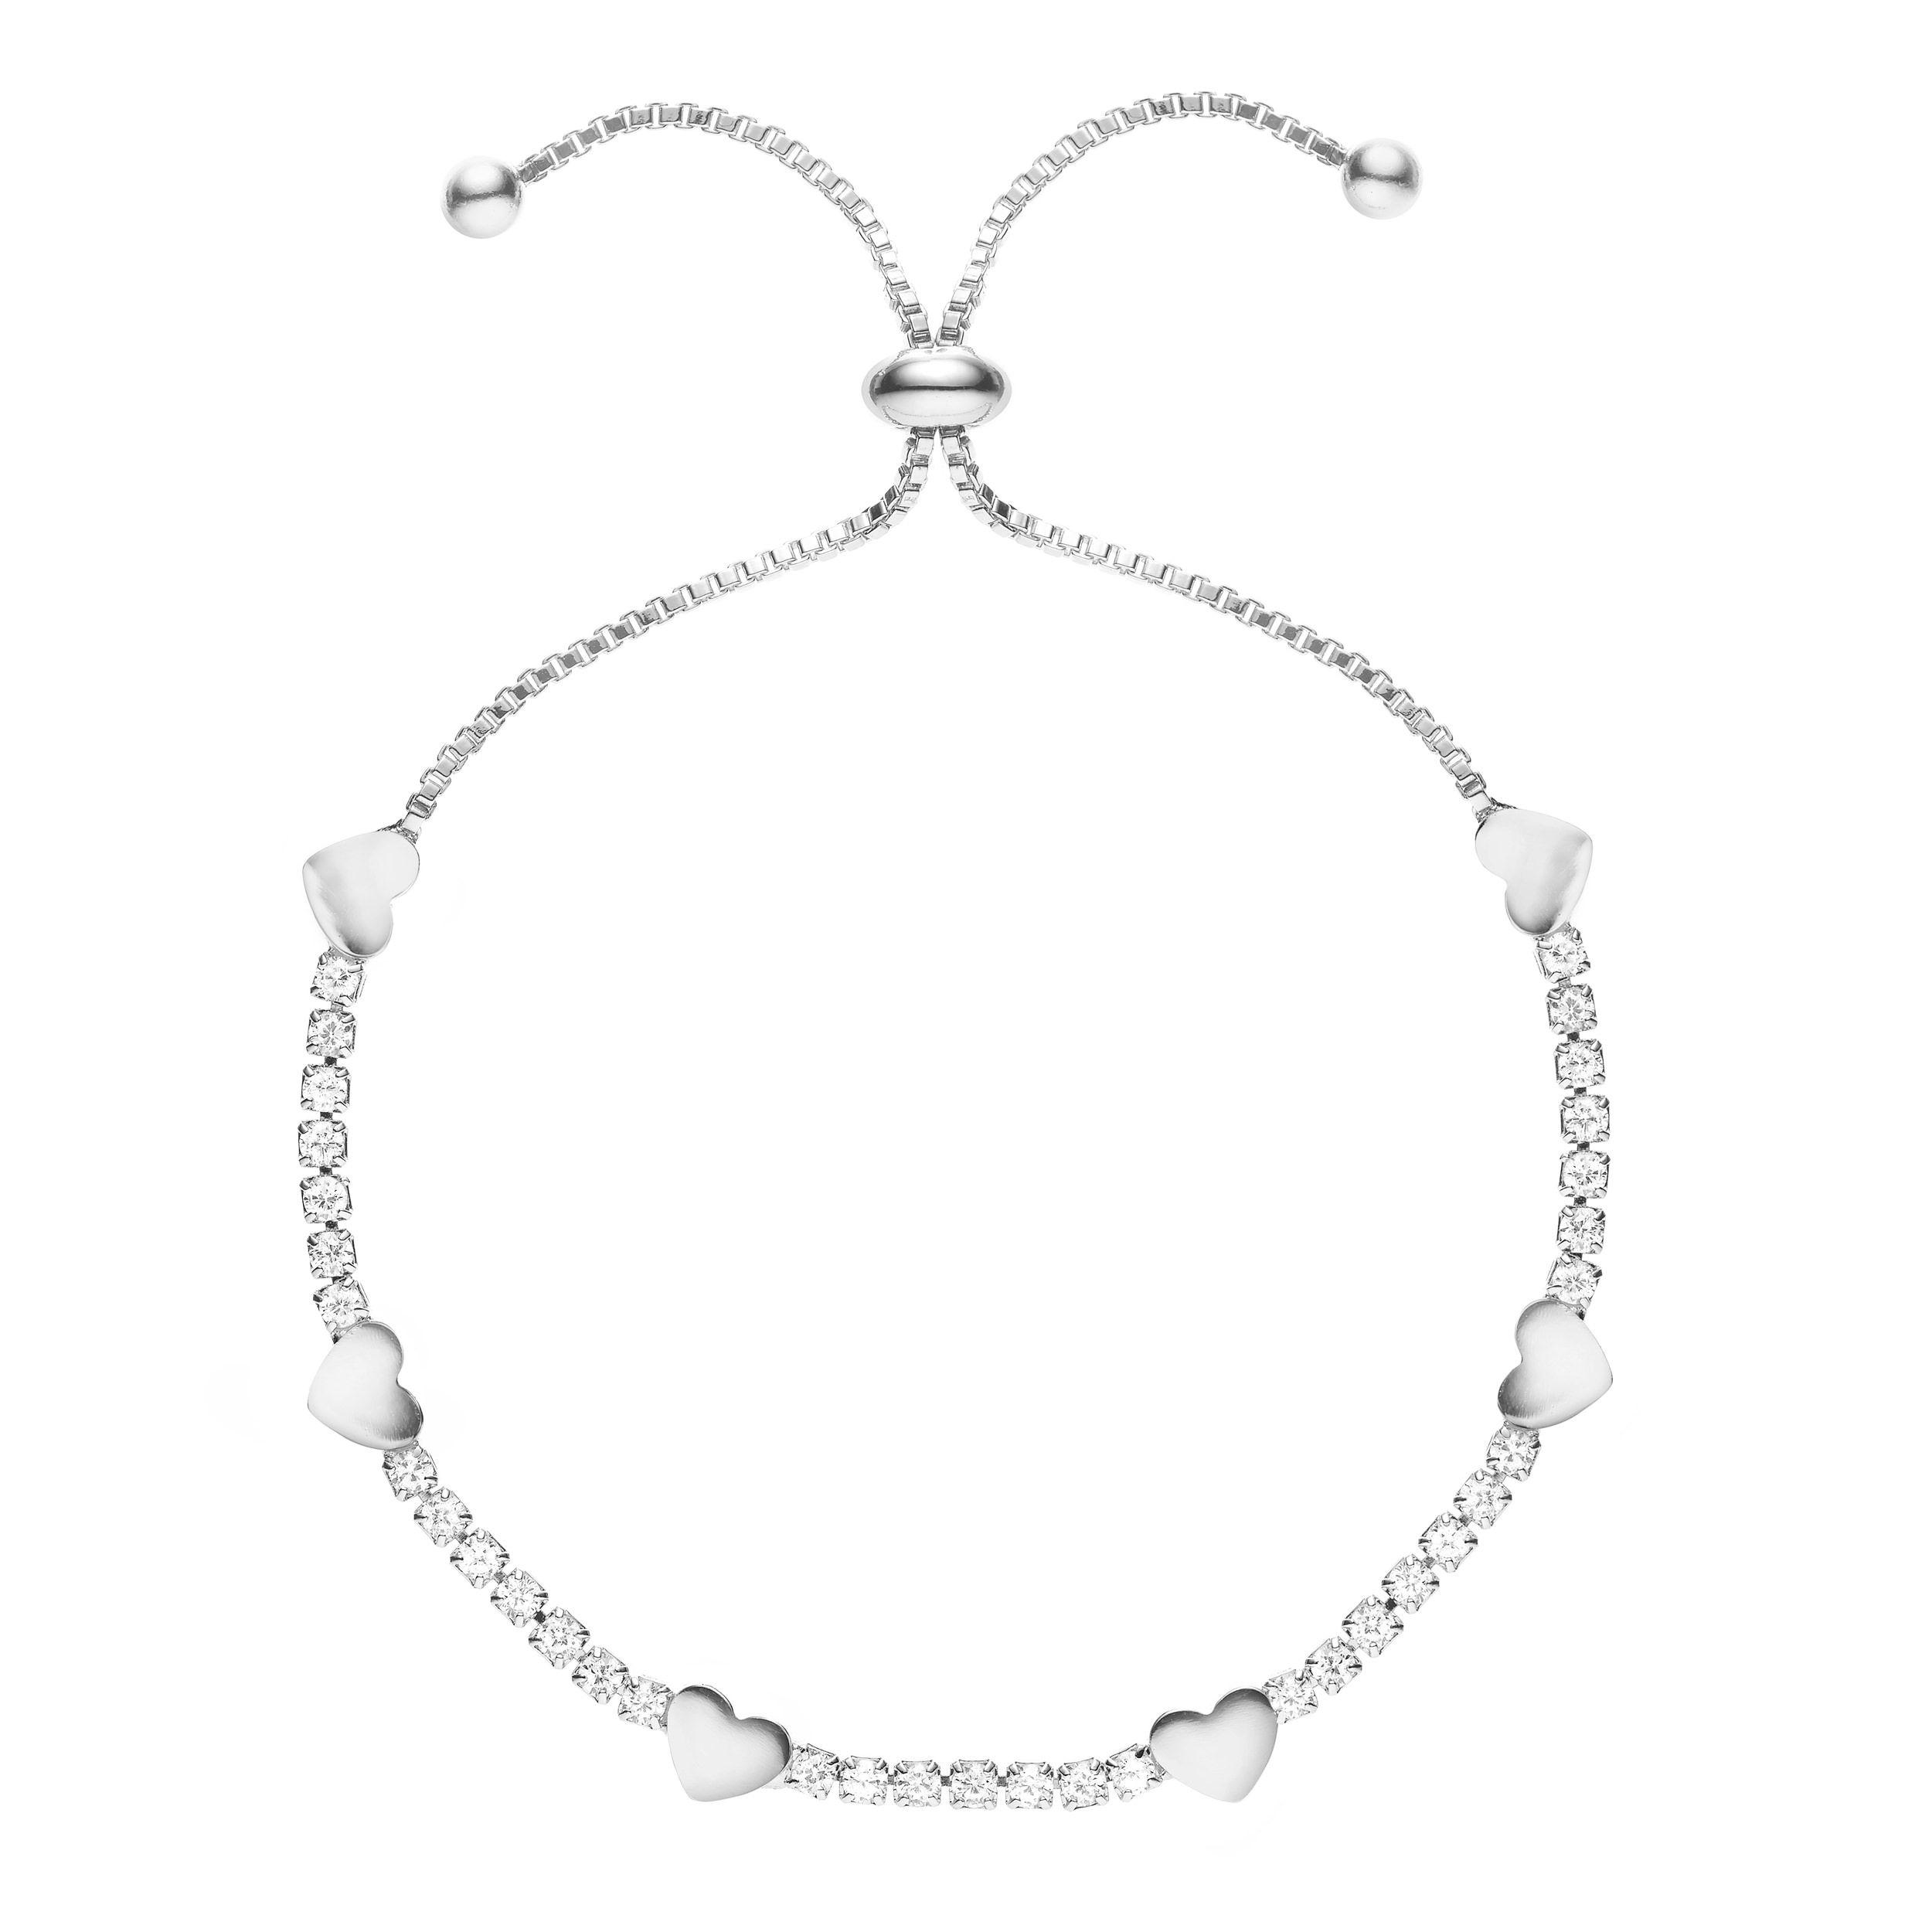 Buckley London Hugs & Kisses '♥' Bracelet - Silver